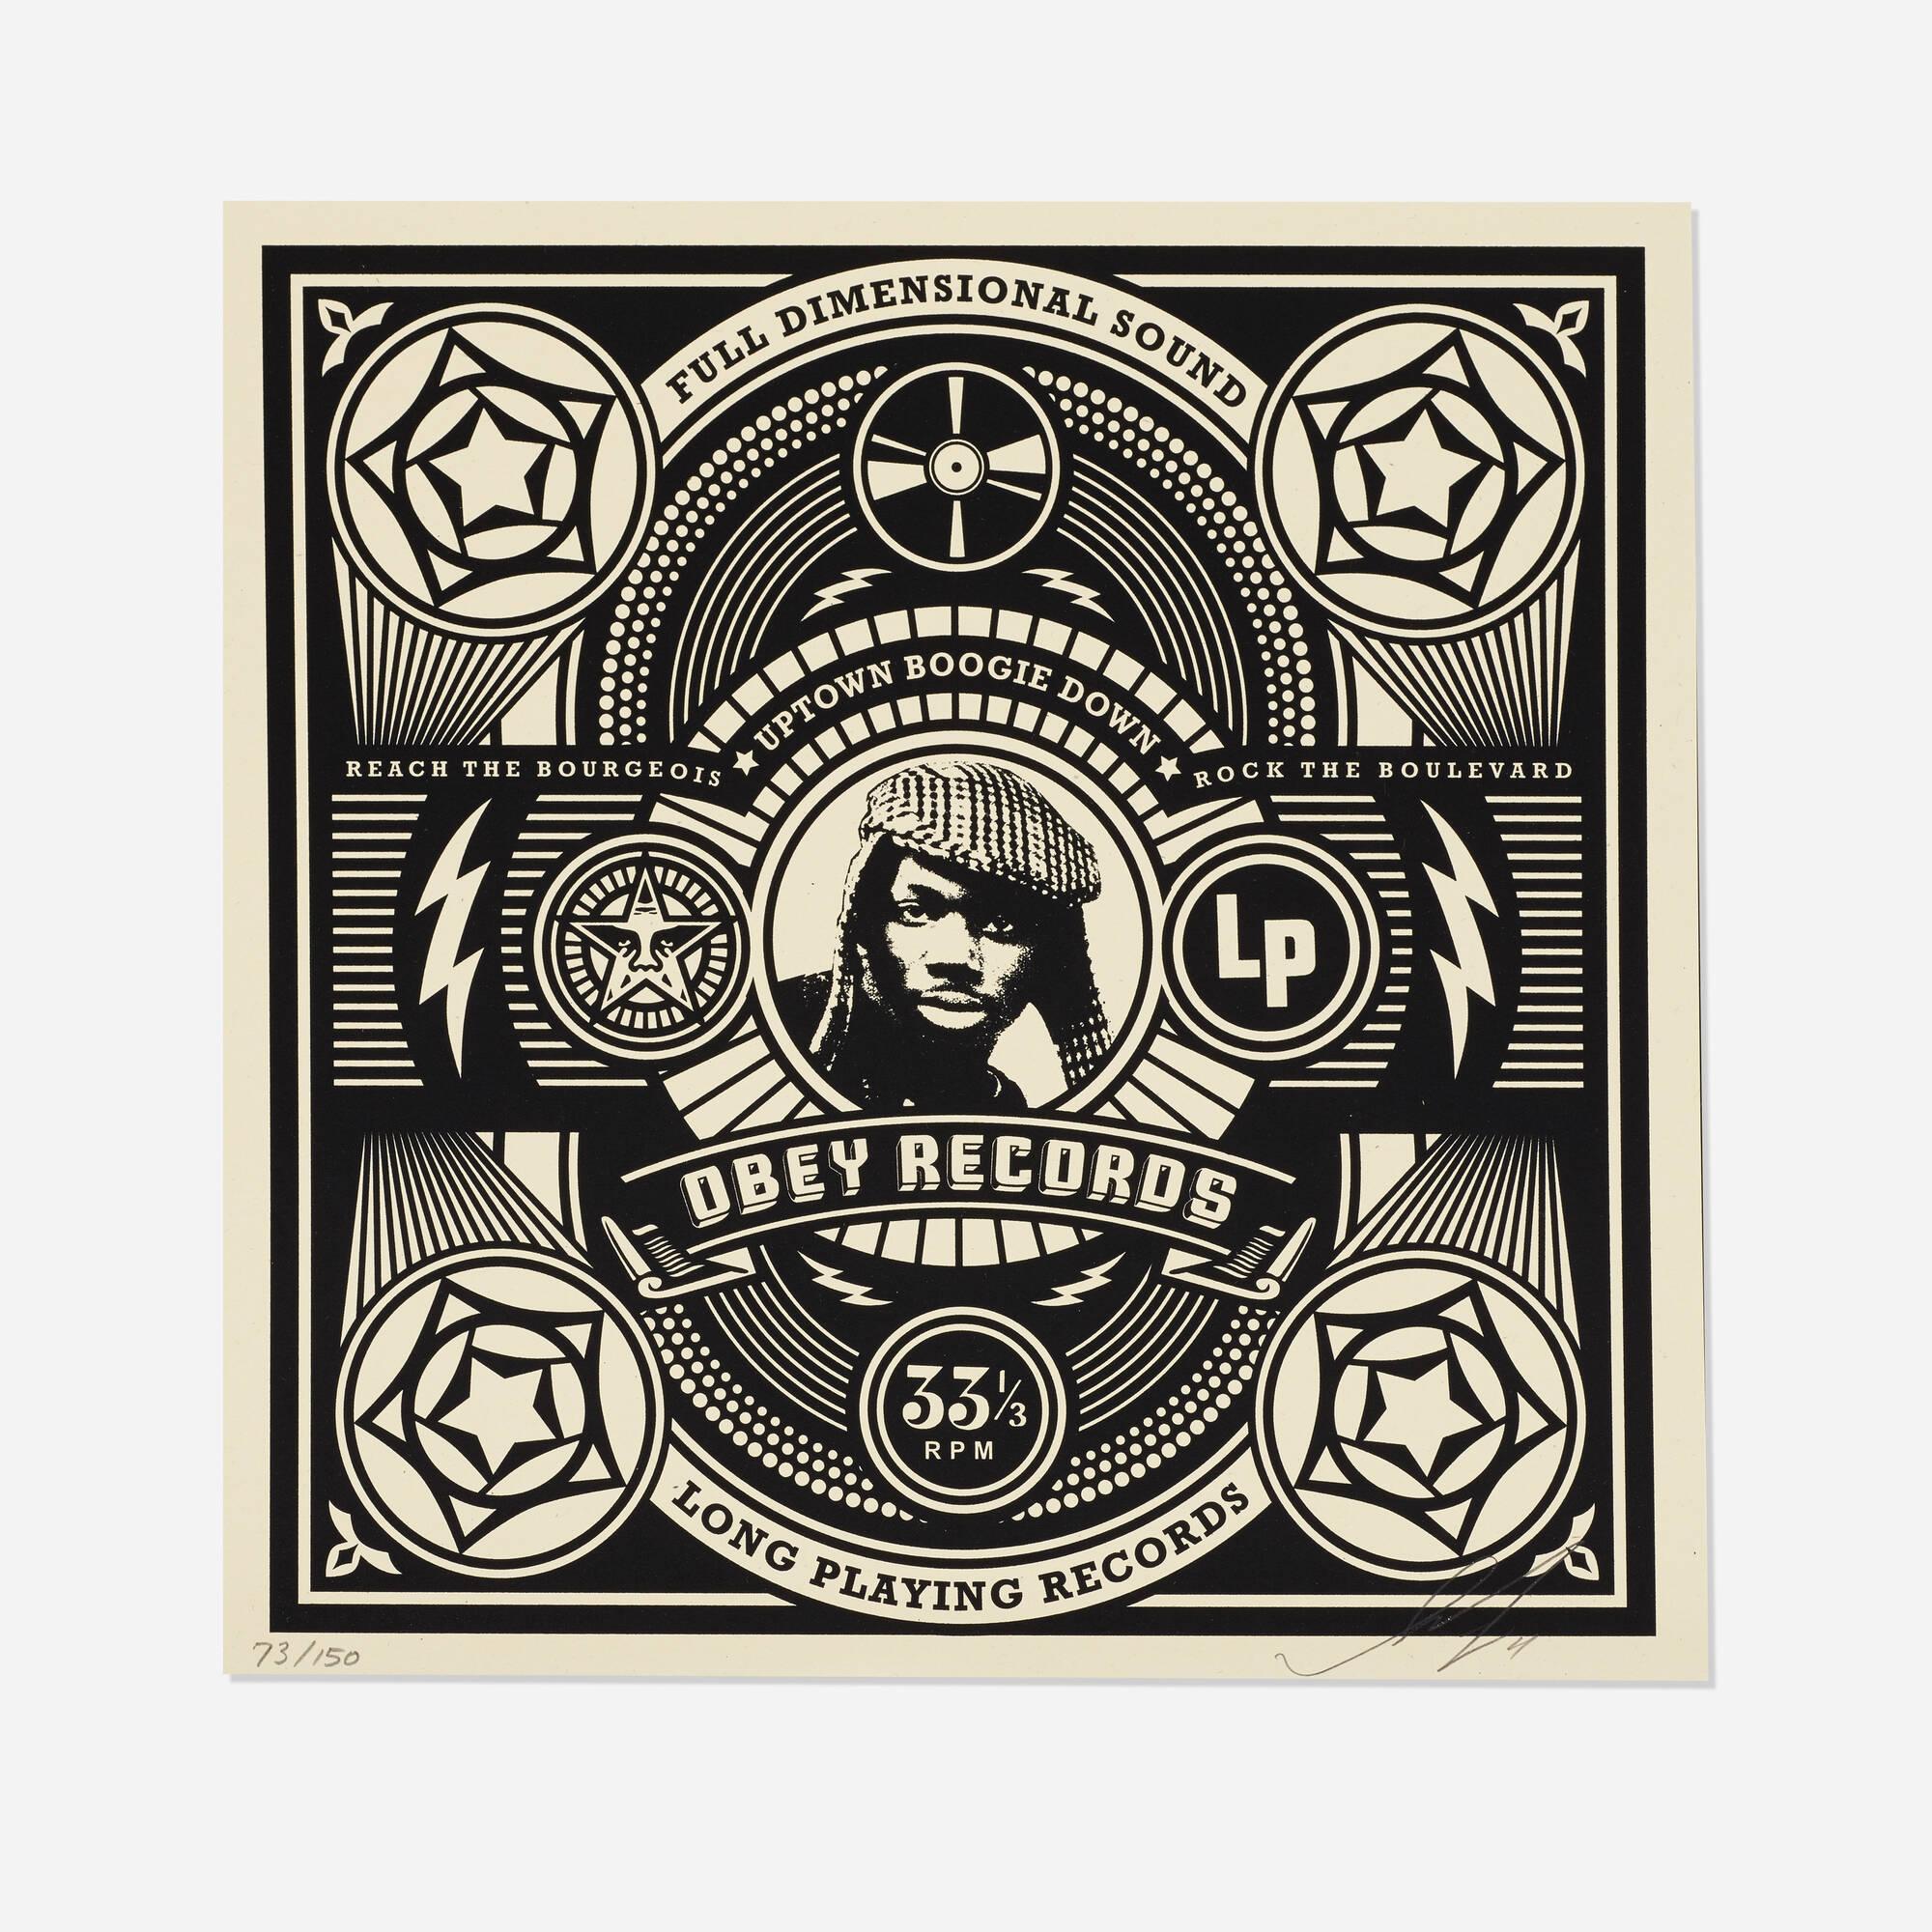 283: Shepard Fairey / Uptown Boogie Down (1 of 1)